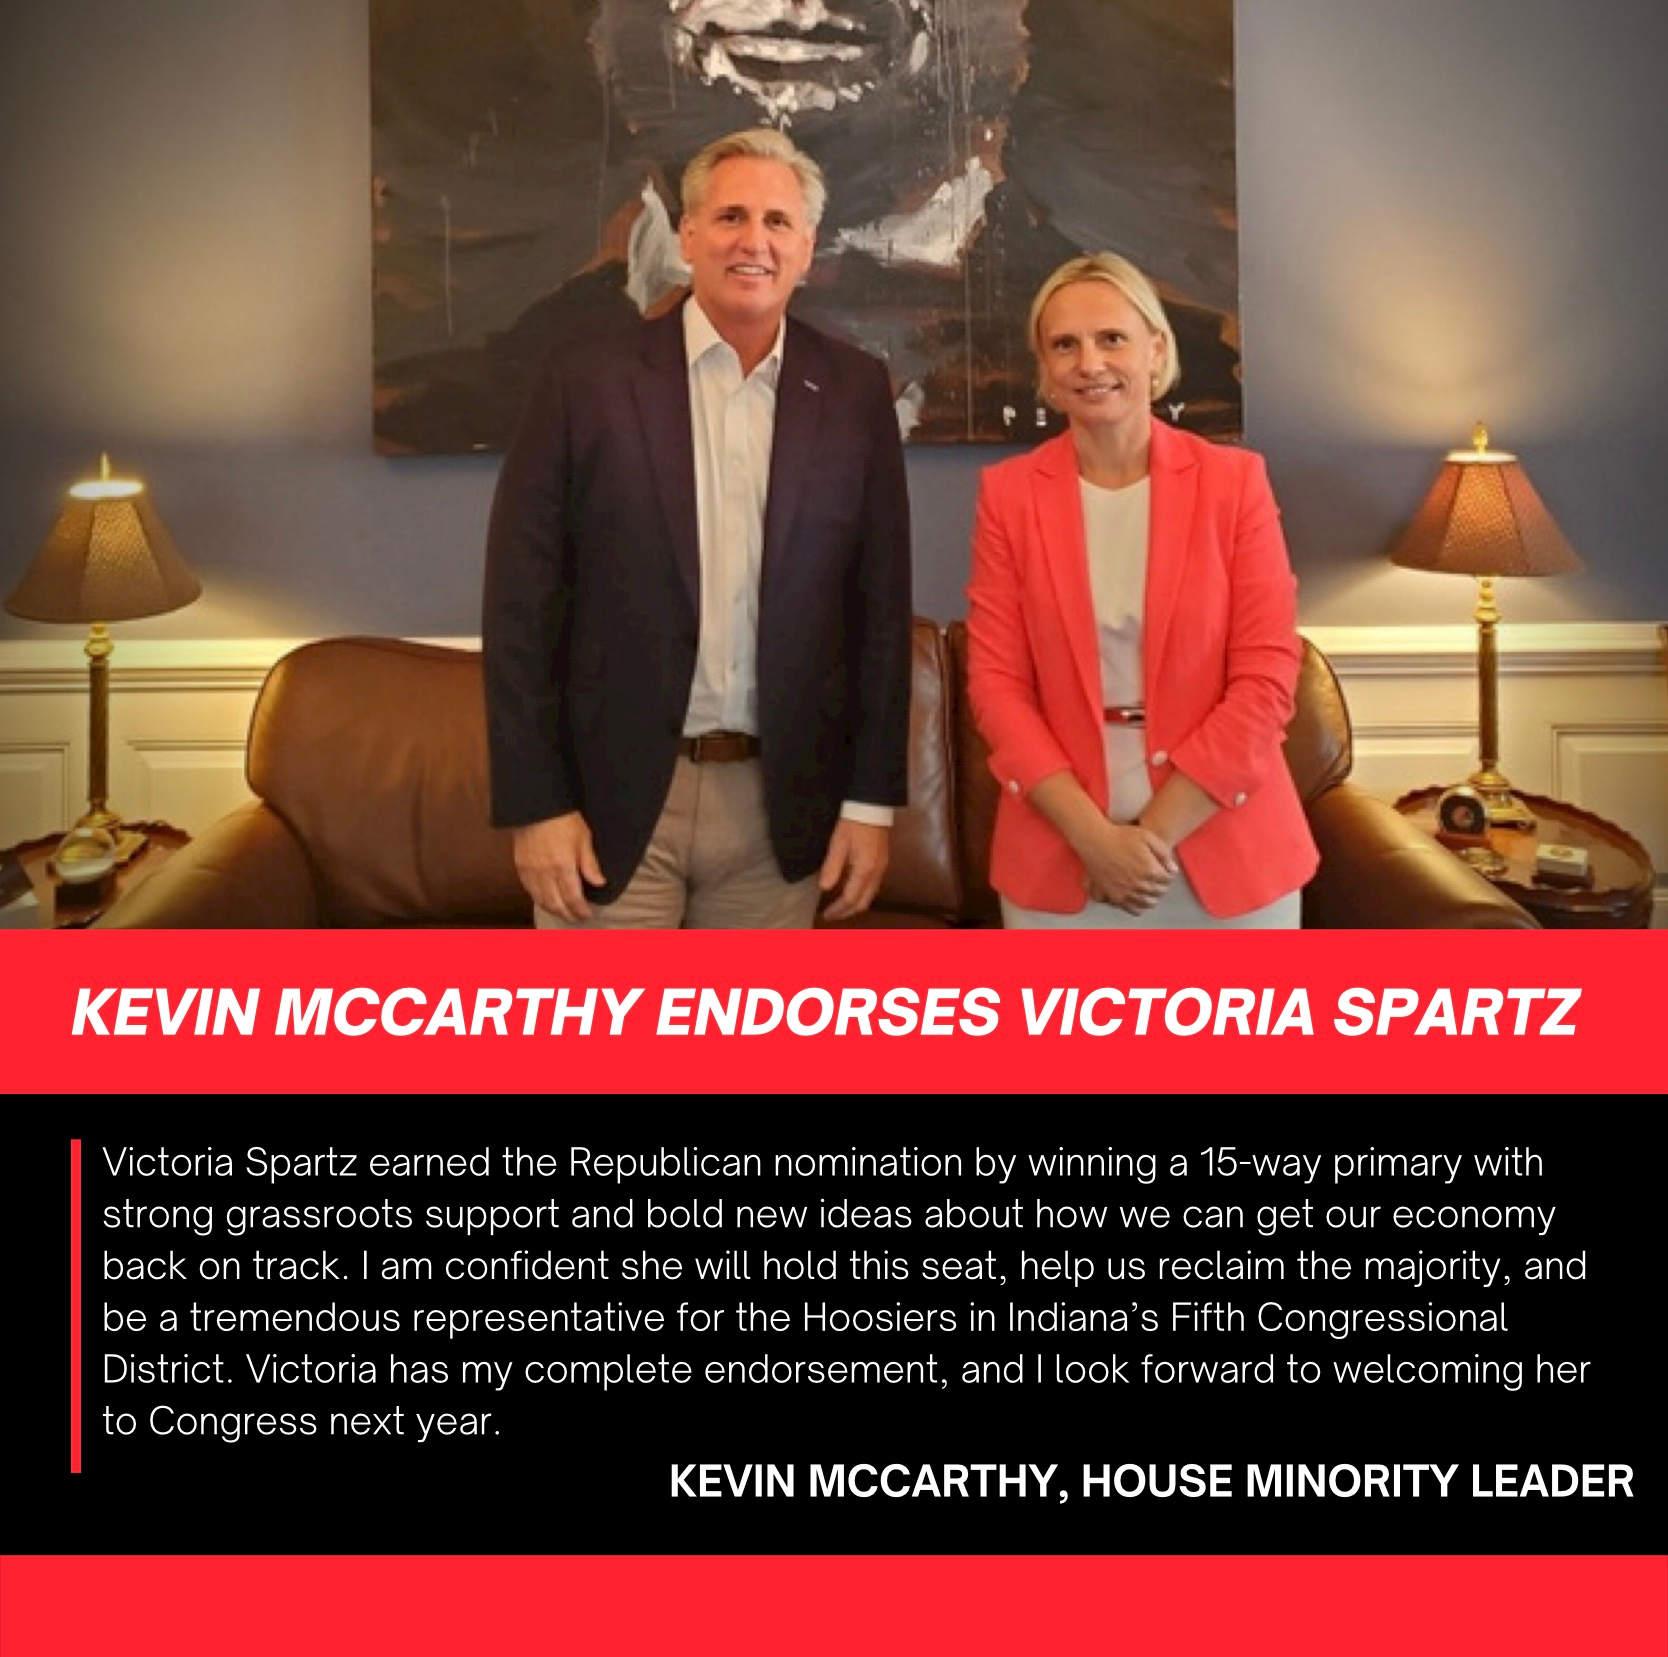 Leader Kevin McCarty endorses Victoria Spartz for Congress